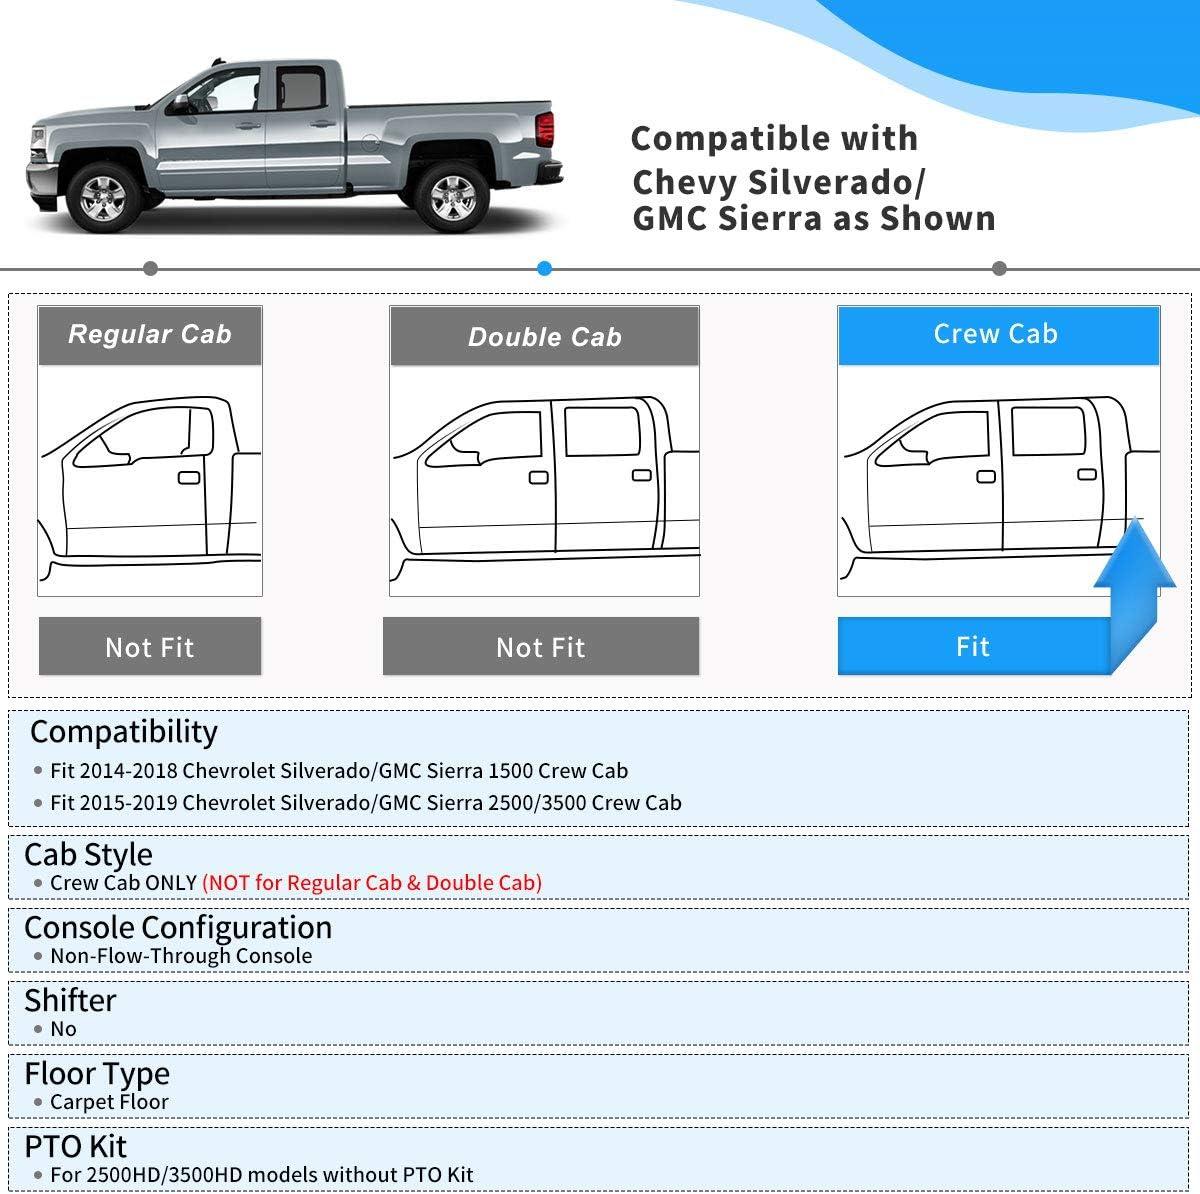 oEdRo Floor Mats Fit 2014-2018 Chevy Silverado//GMC Sierra 1500 Crew Cab Black TPE All Weather 2 Row Floor Liner Set Front /& 2nd Seat / 2015-2019 Silverado//Sierra 2500 HD//3500 HD Crew Cab